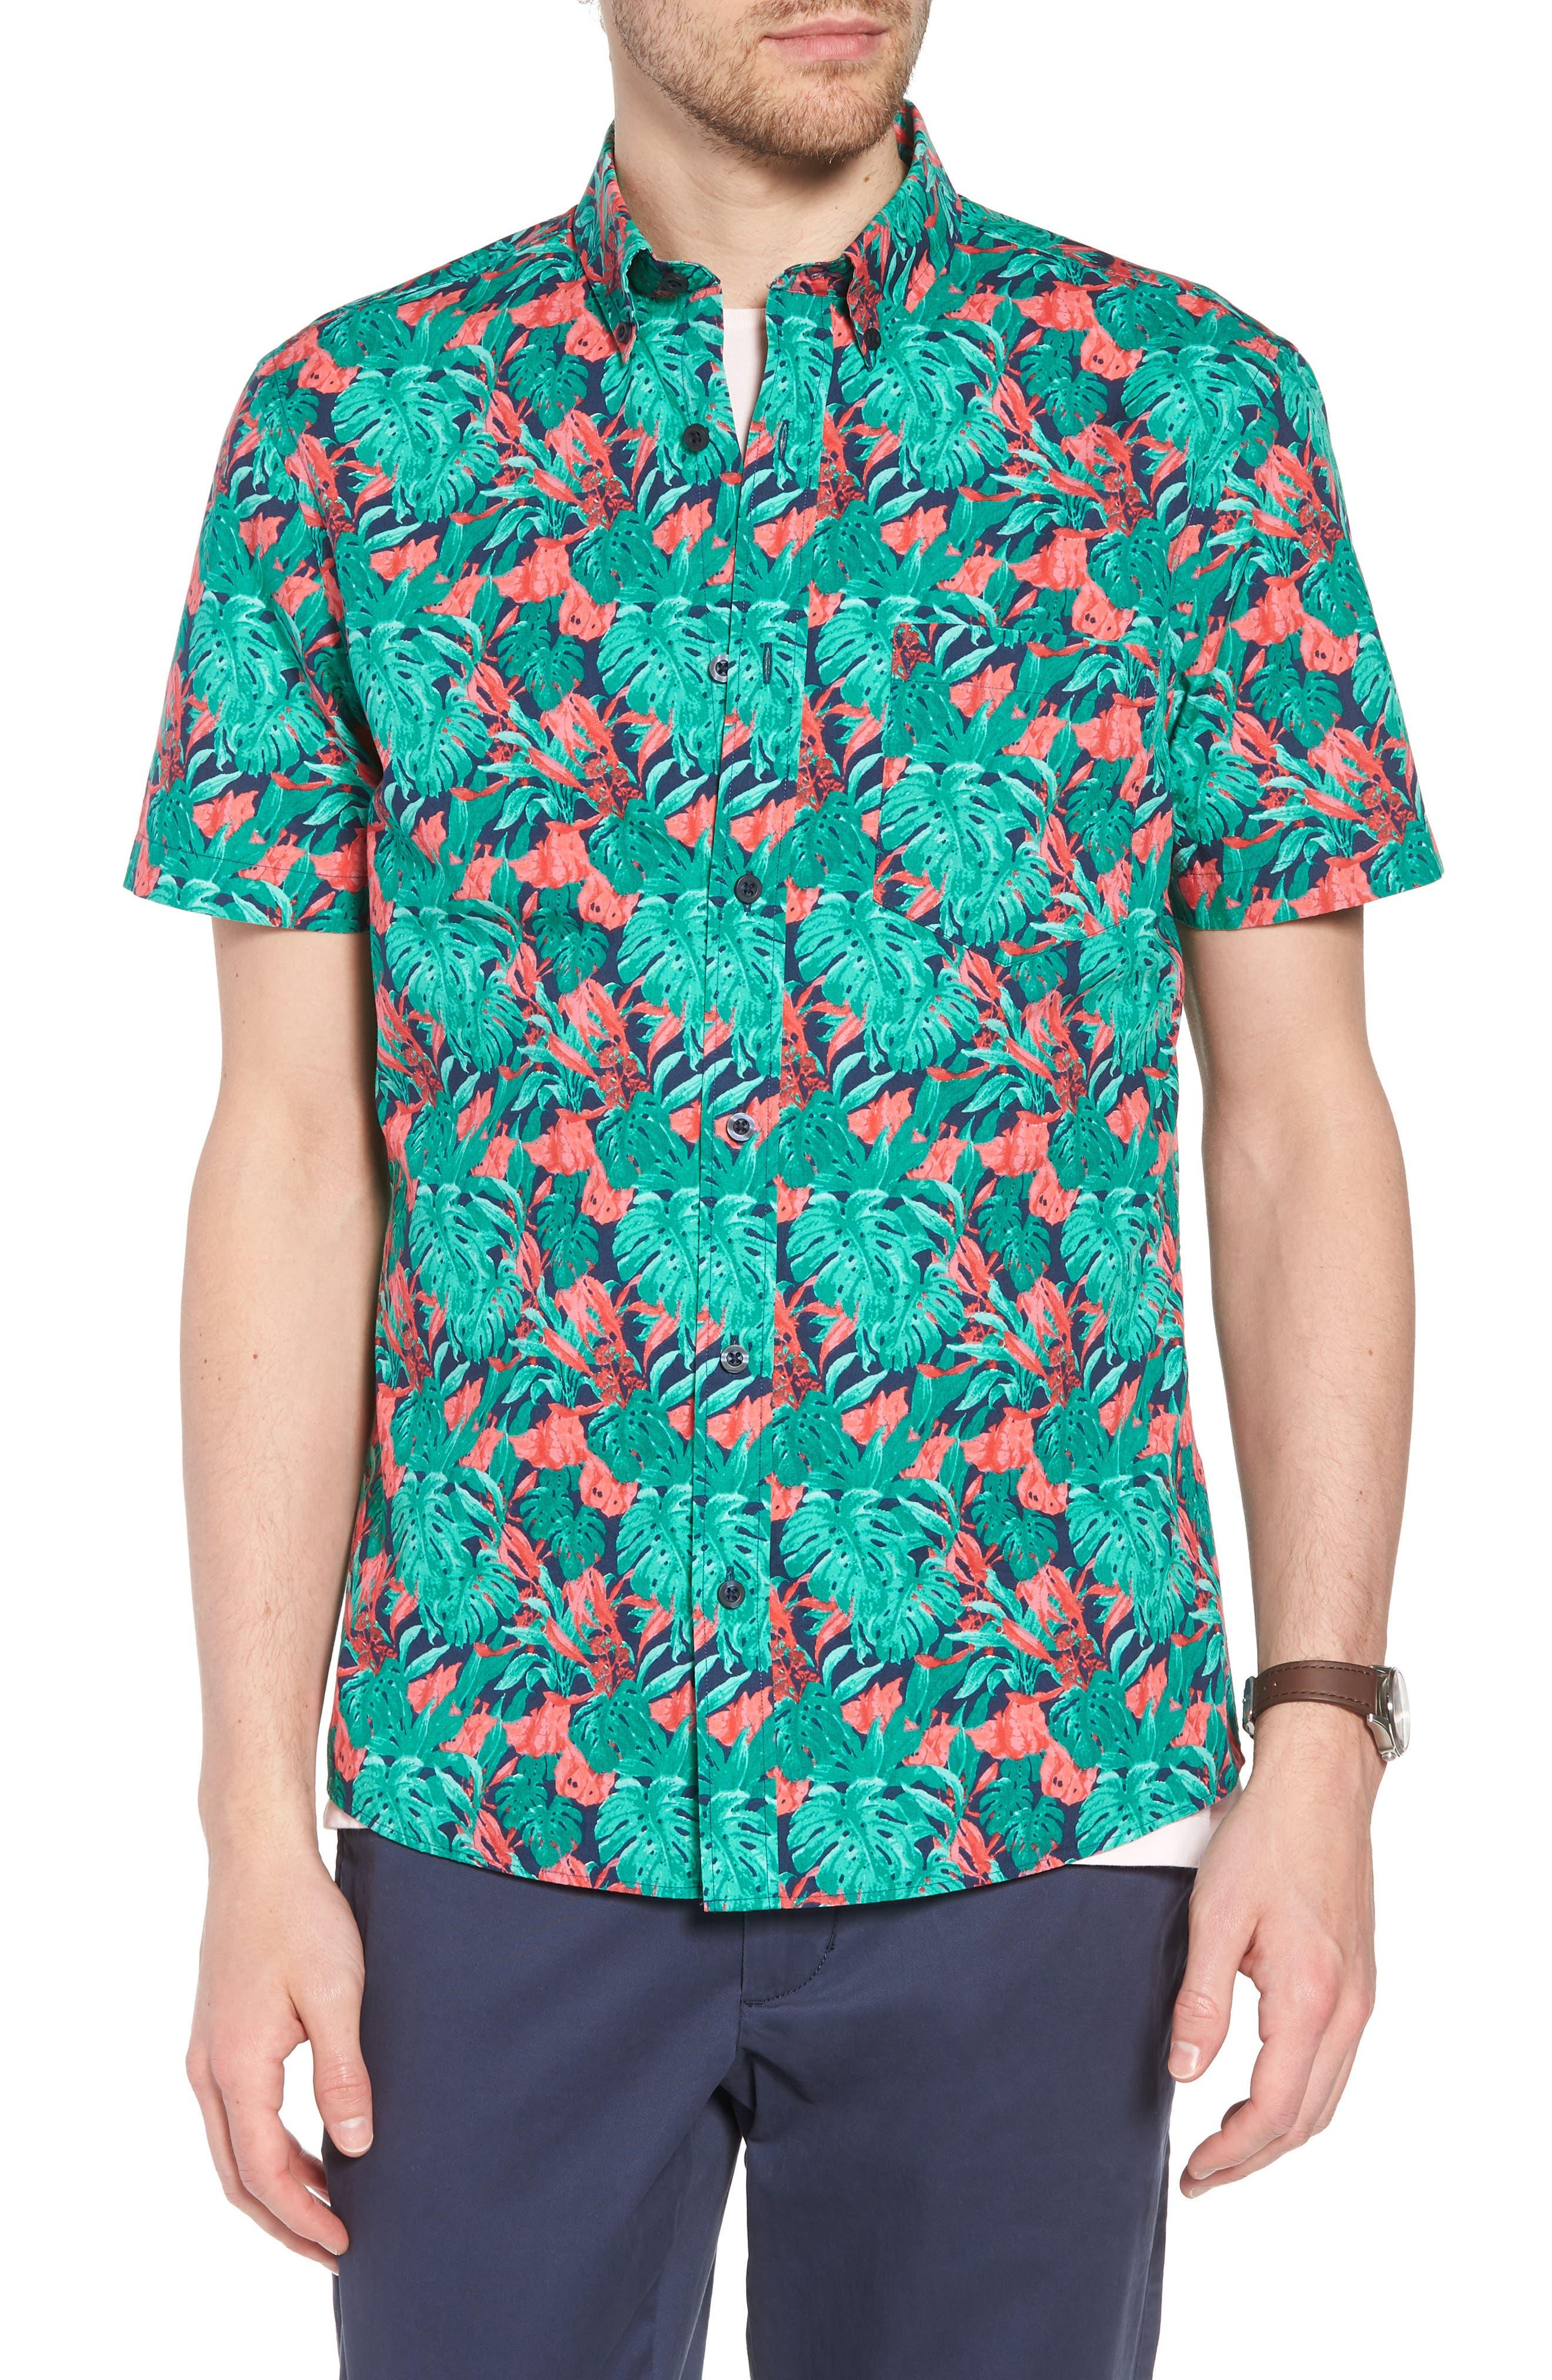 Trim Fit Print Short Sleeve Sport Shirt,                         Main,                         color, Green Red Split Leaves